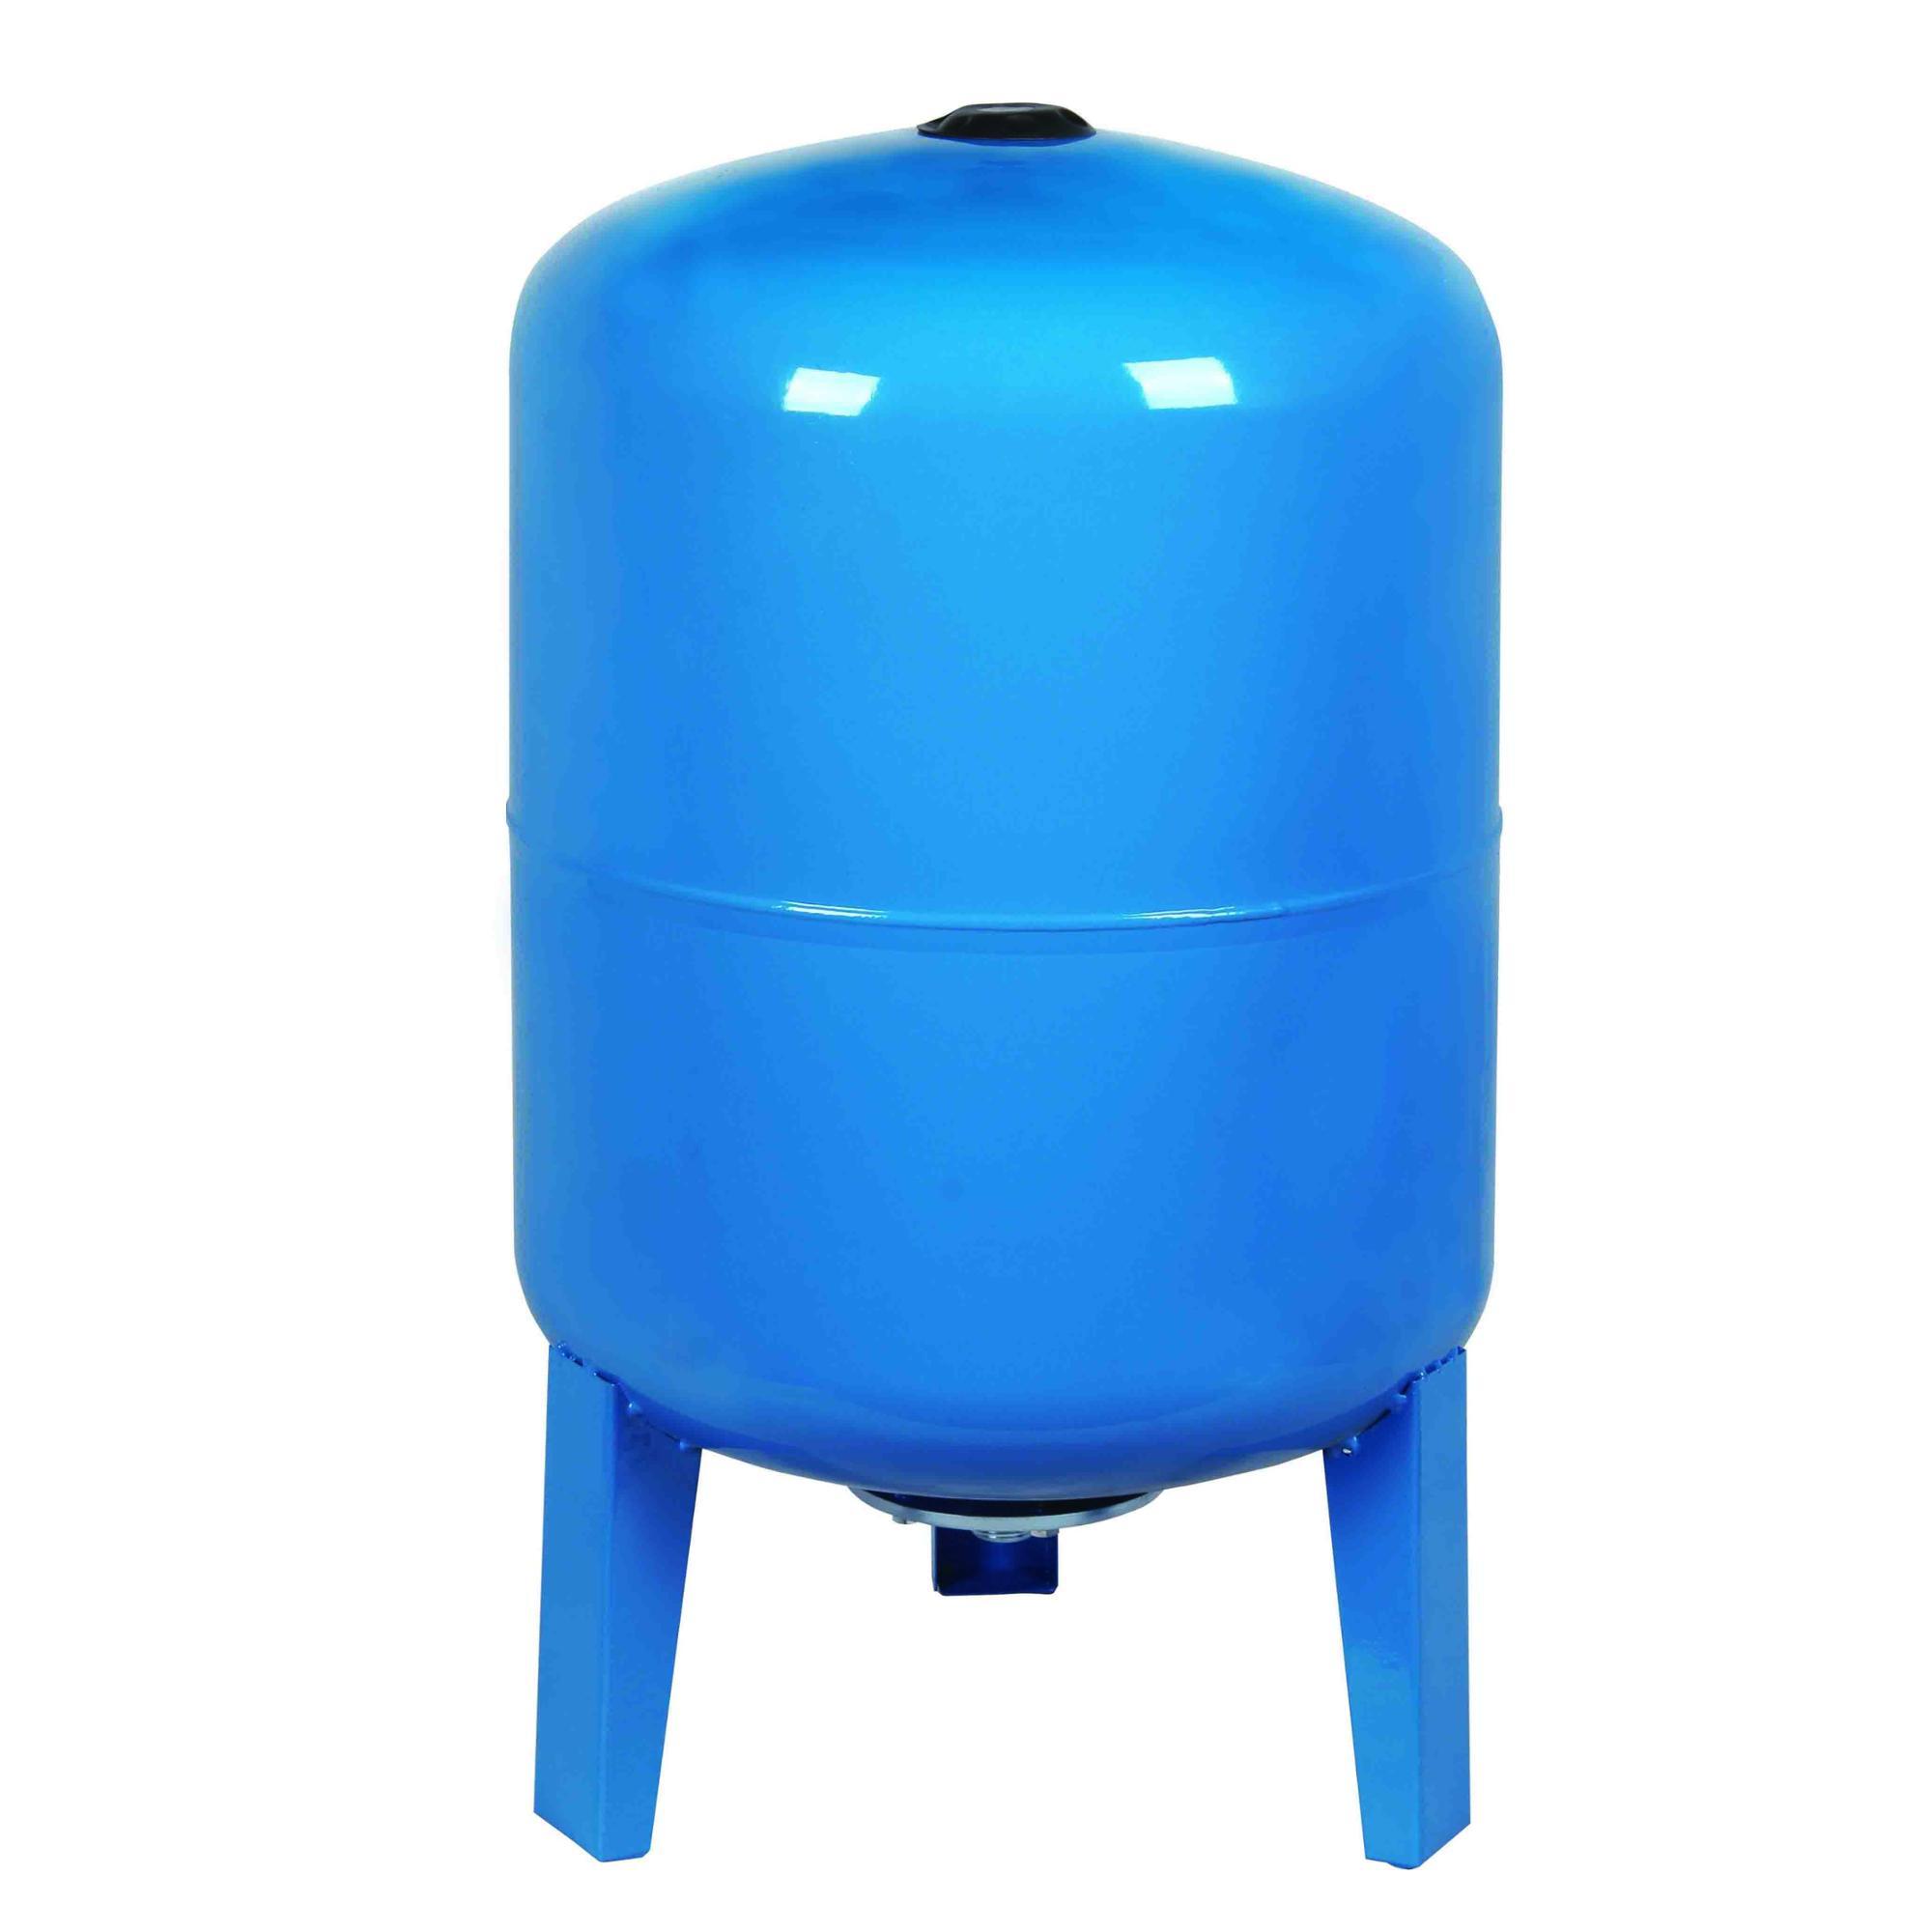 50L vertical type carbon steel blue color pressure tank